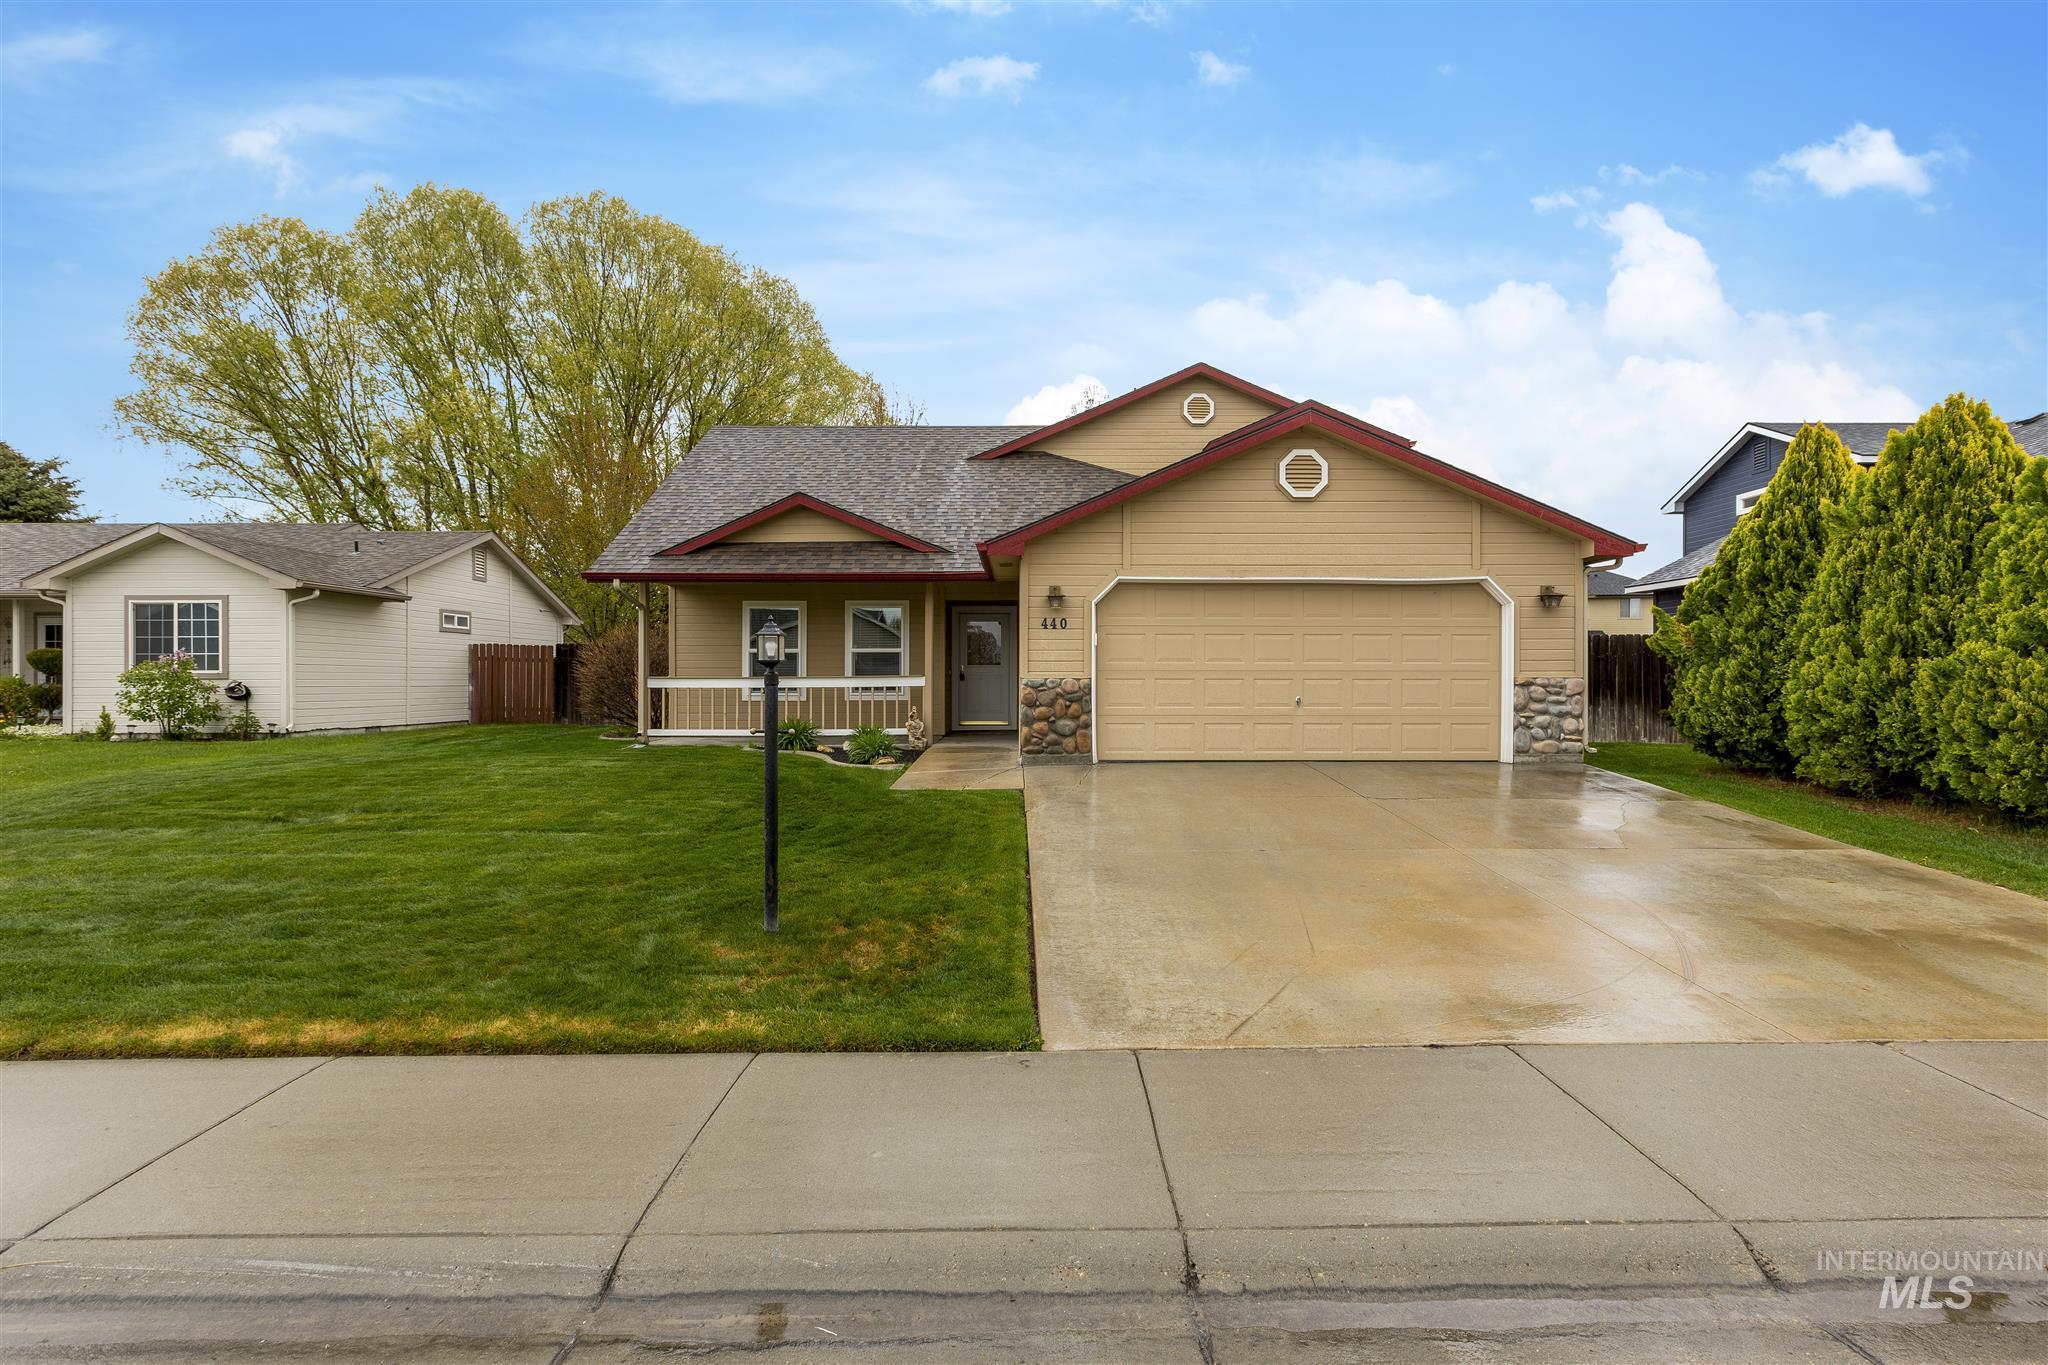 440 N Nebula Ave Property Photo - Star, ID real estate listing